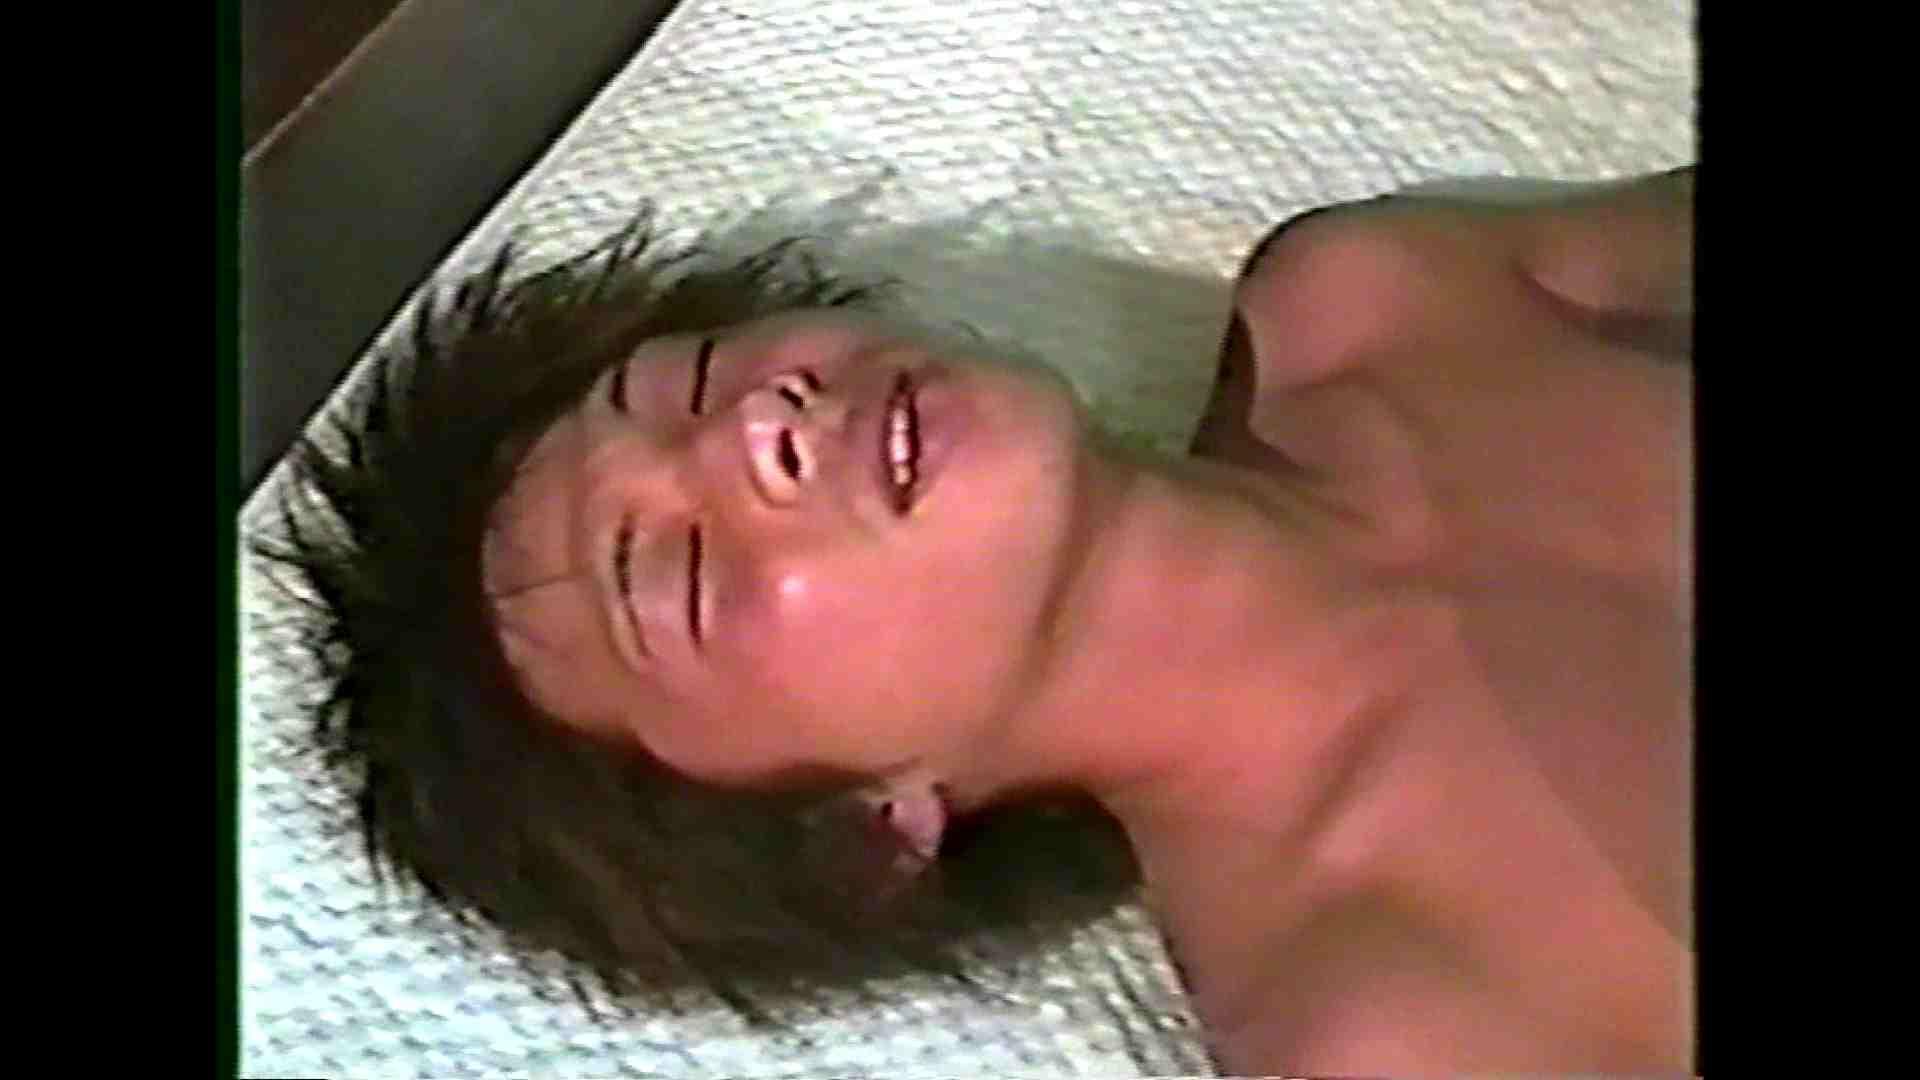 MADOKAさんのズリネタコレクションVol.3-3 生挿入シーン ちんぽ画像 67枚 38